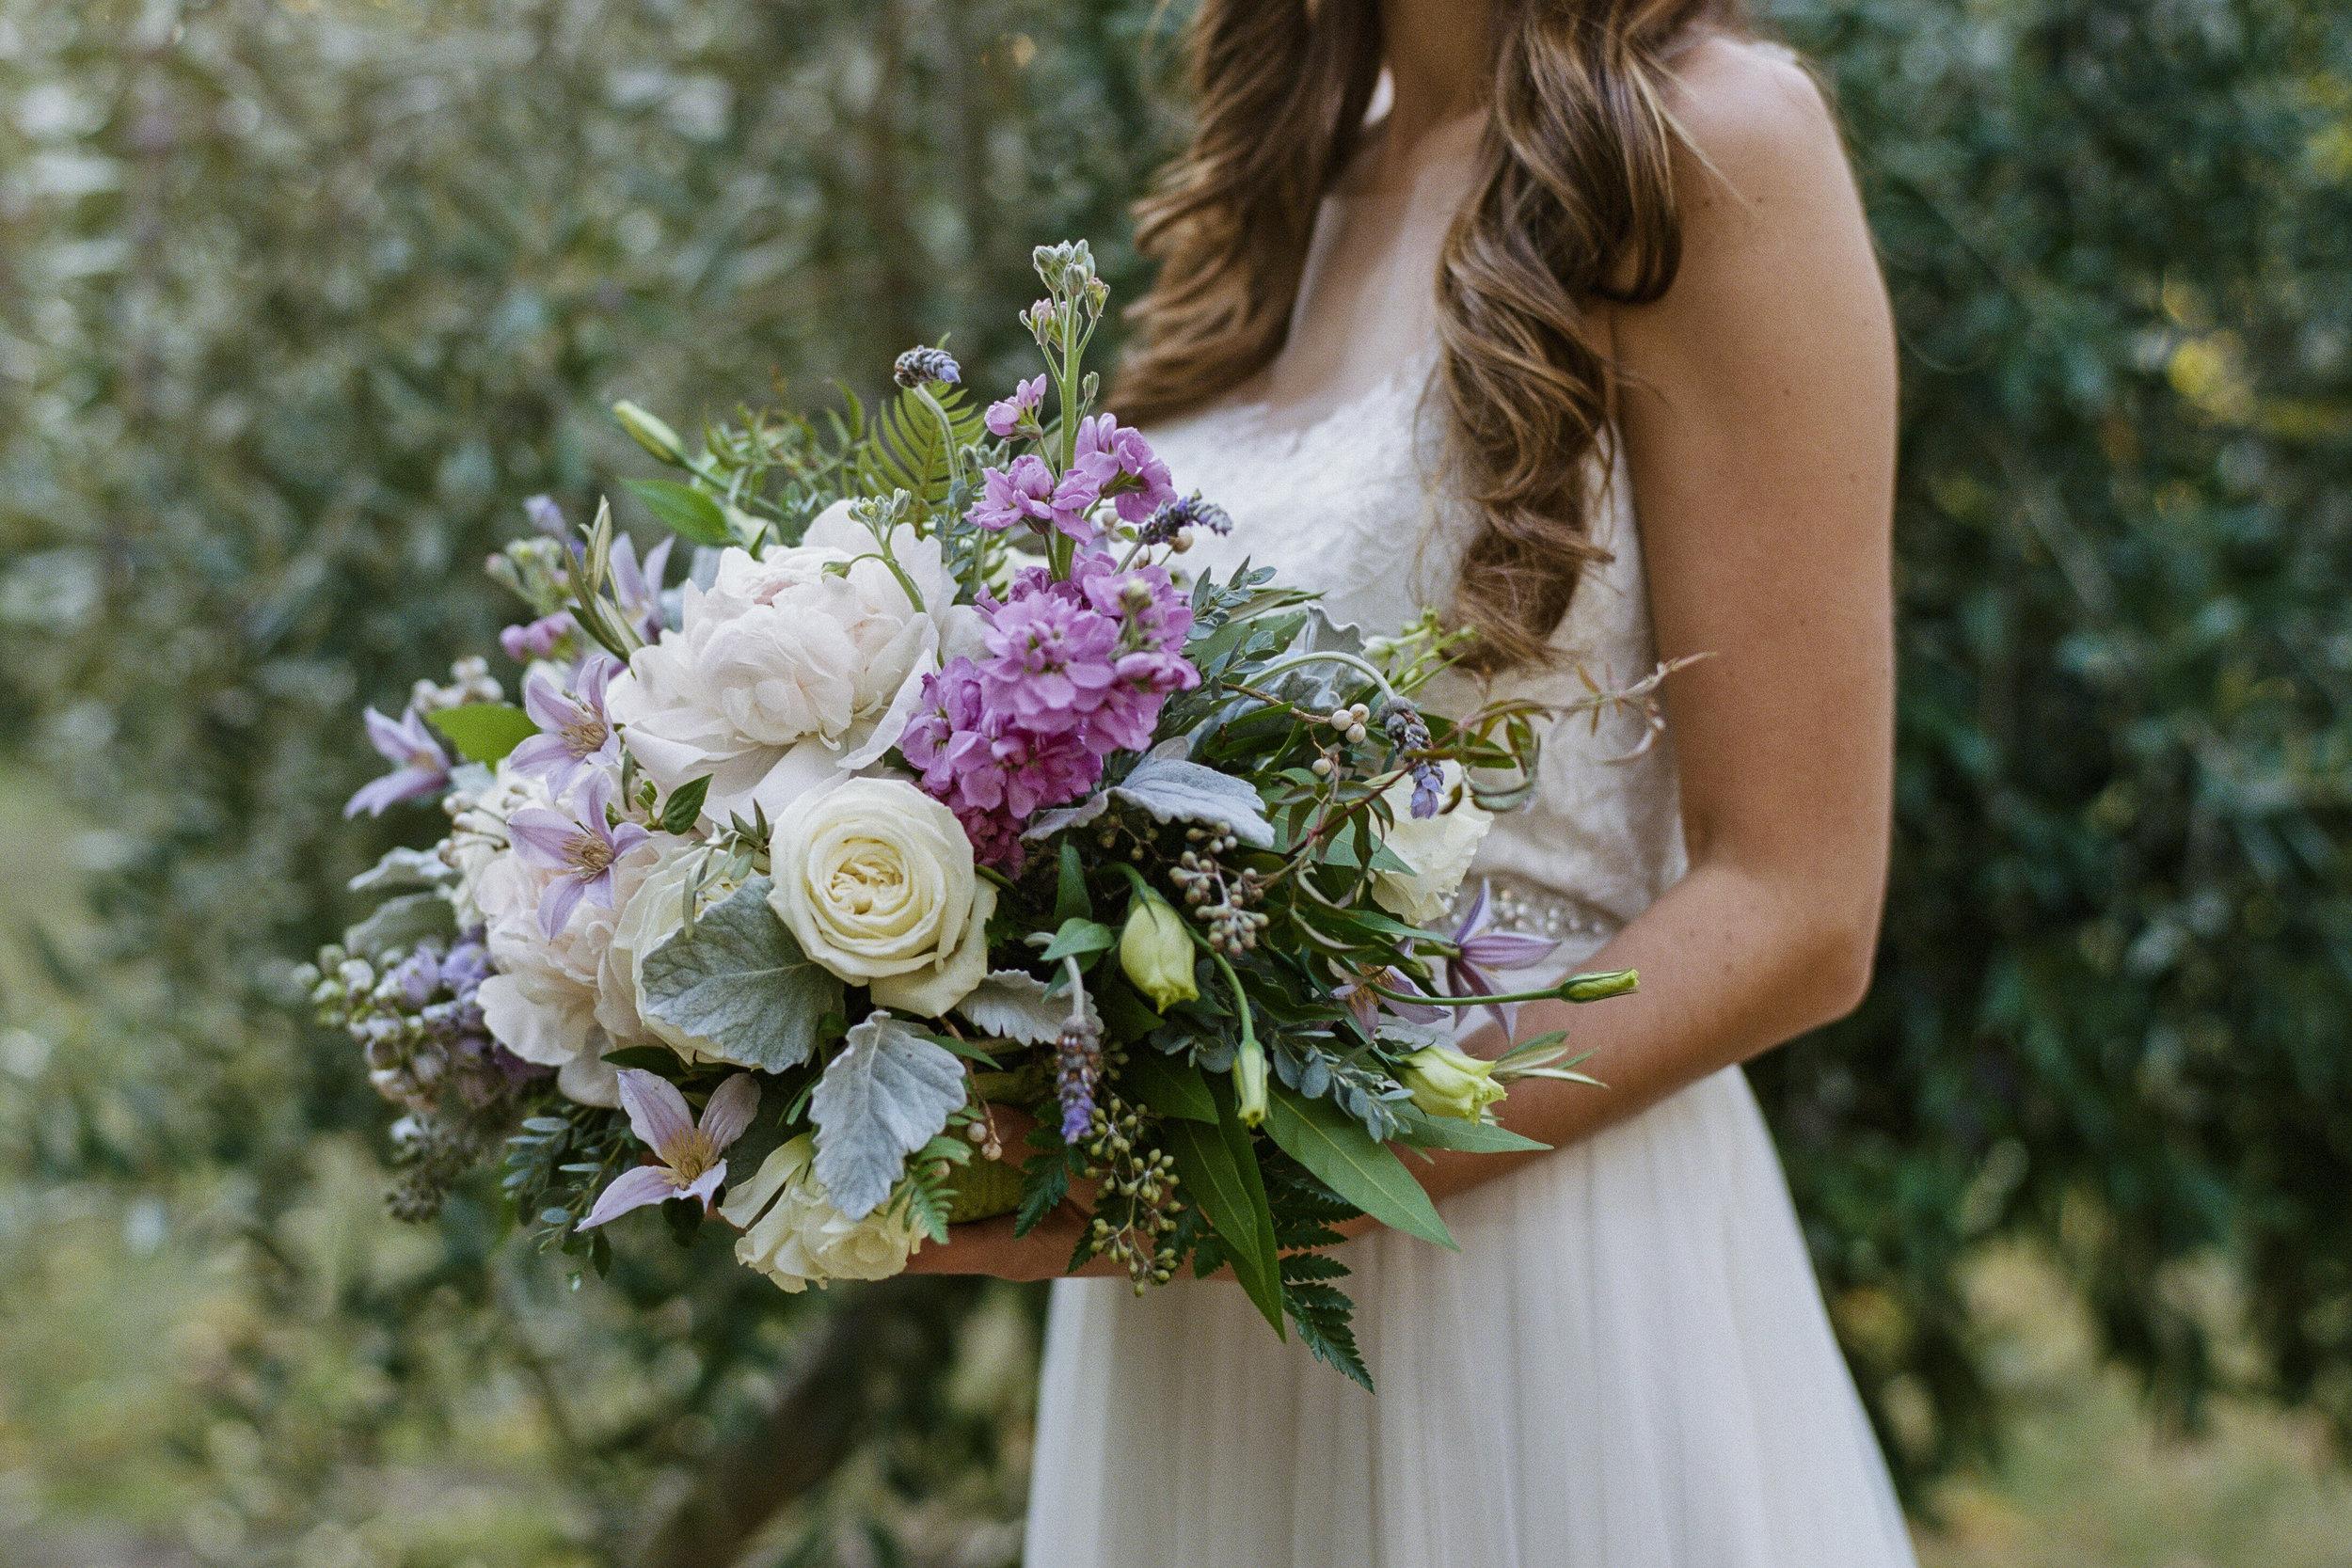 Violette-fleurs-roseville-sacramento-california-wedding-florist-spring-purples-centerpiece.jpg